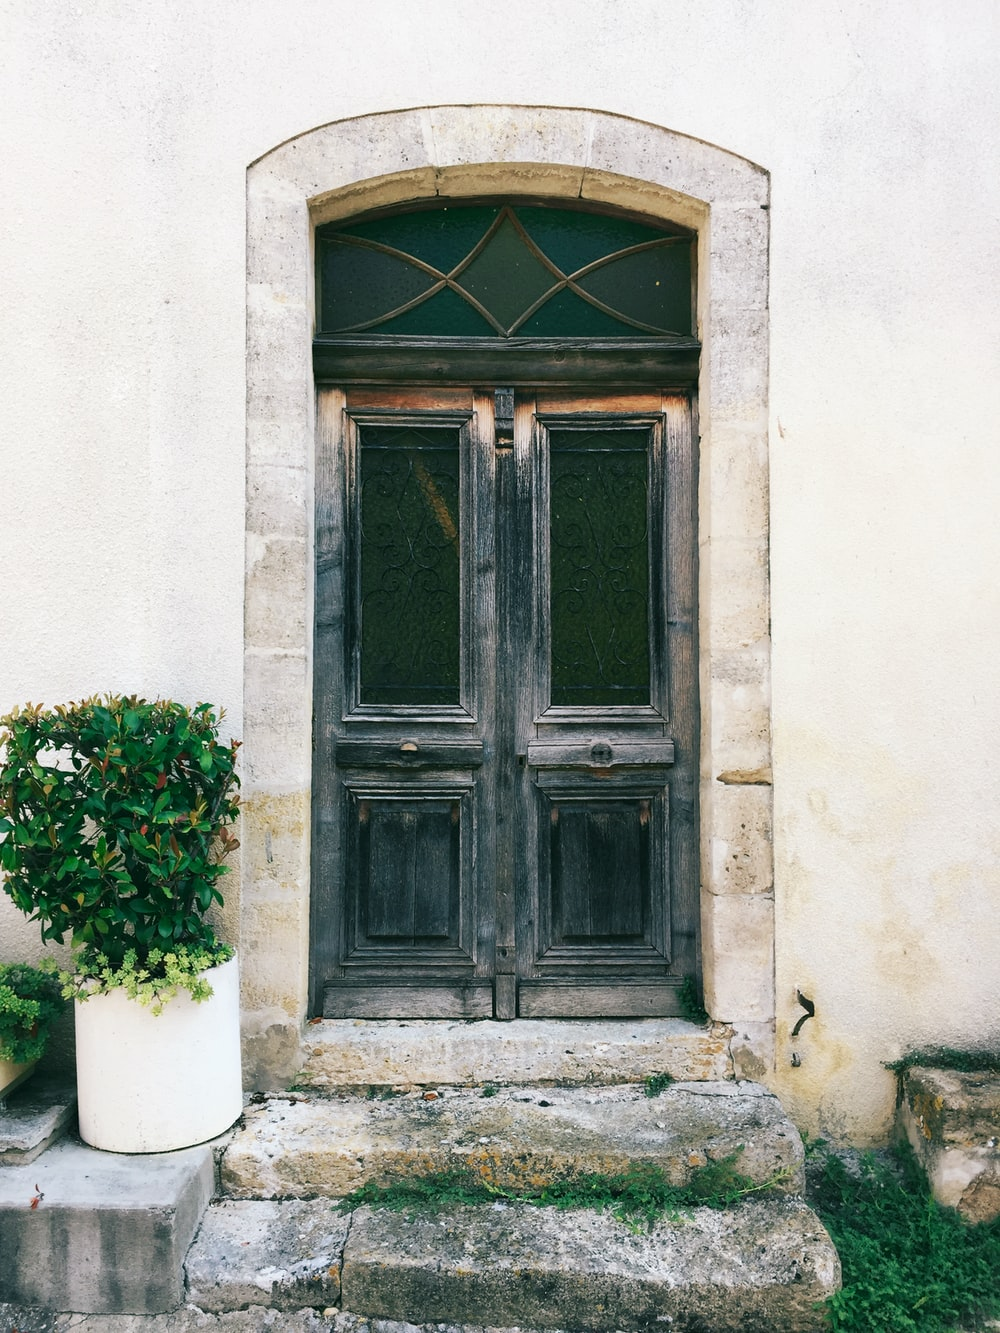 closed door at daytime